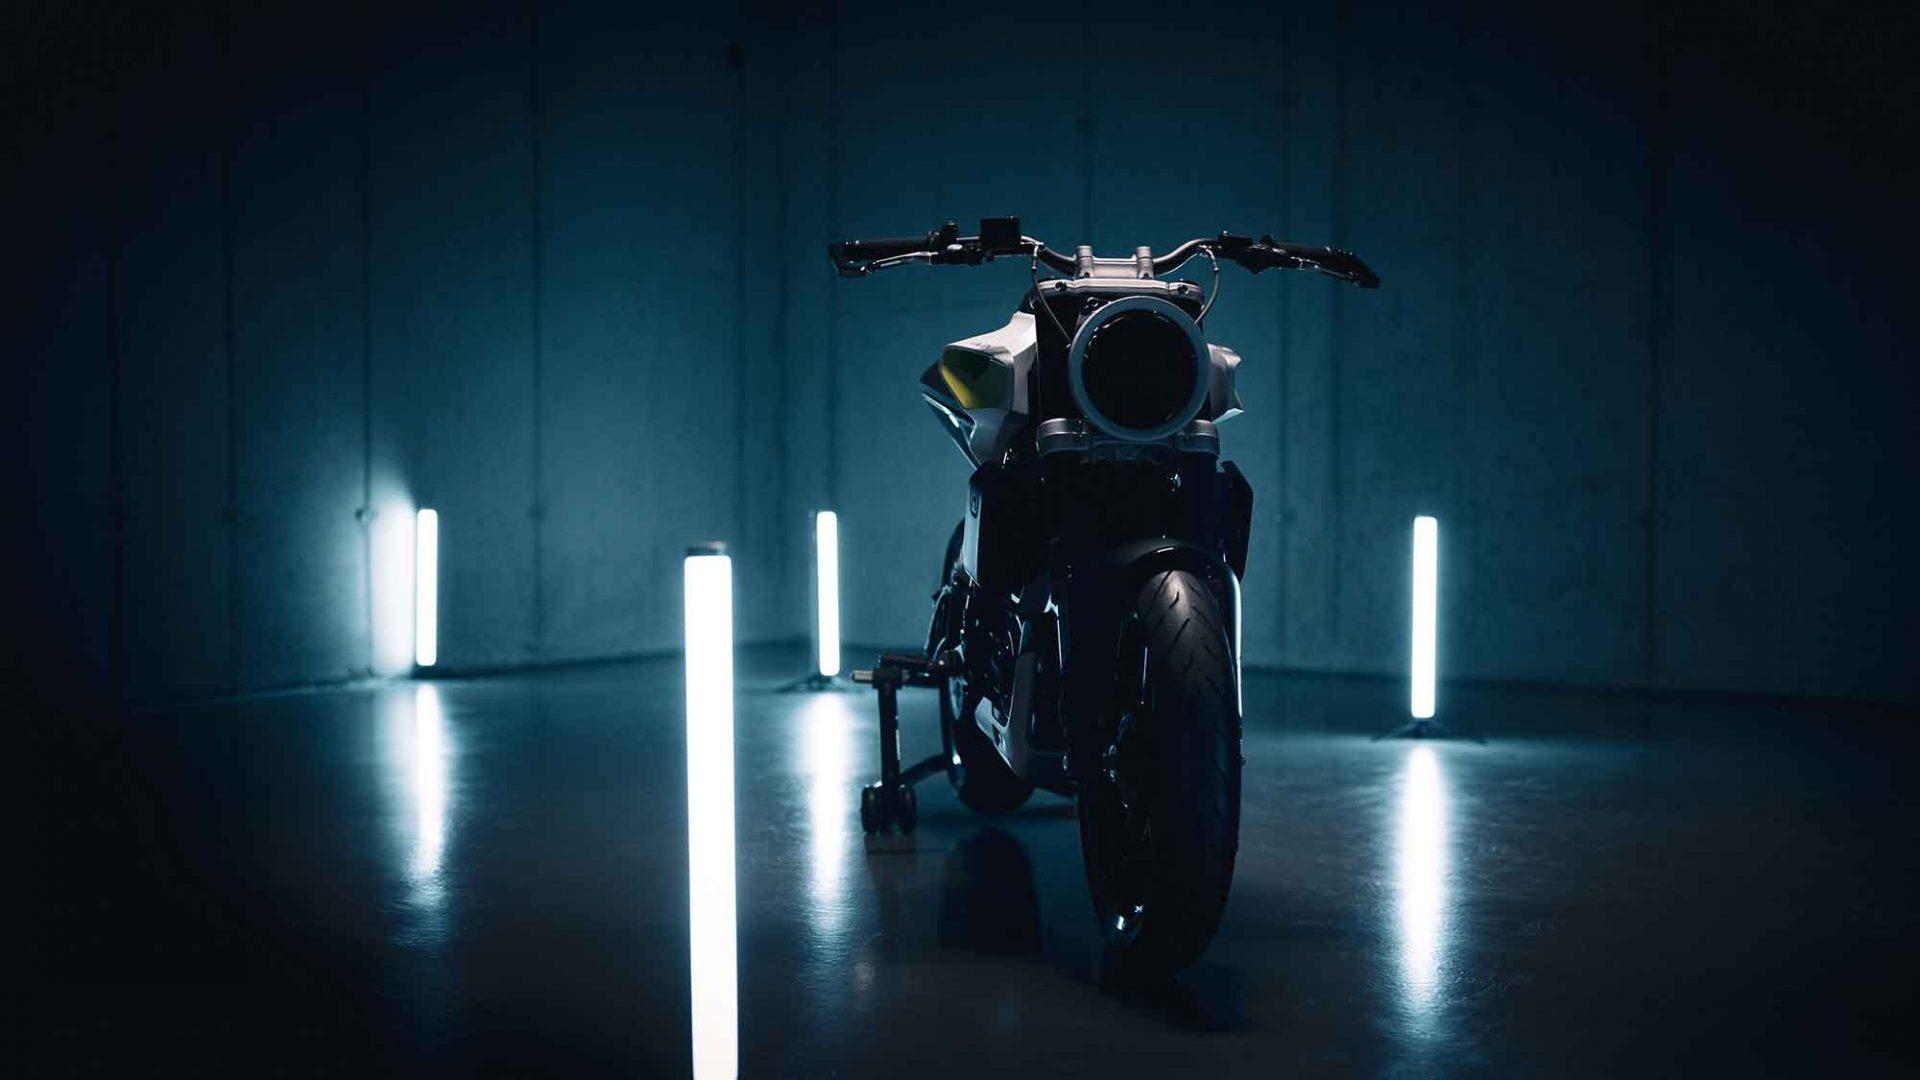 E-Pilen, Husqvarna Motorcycles